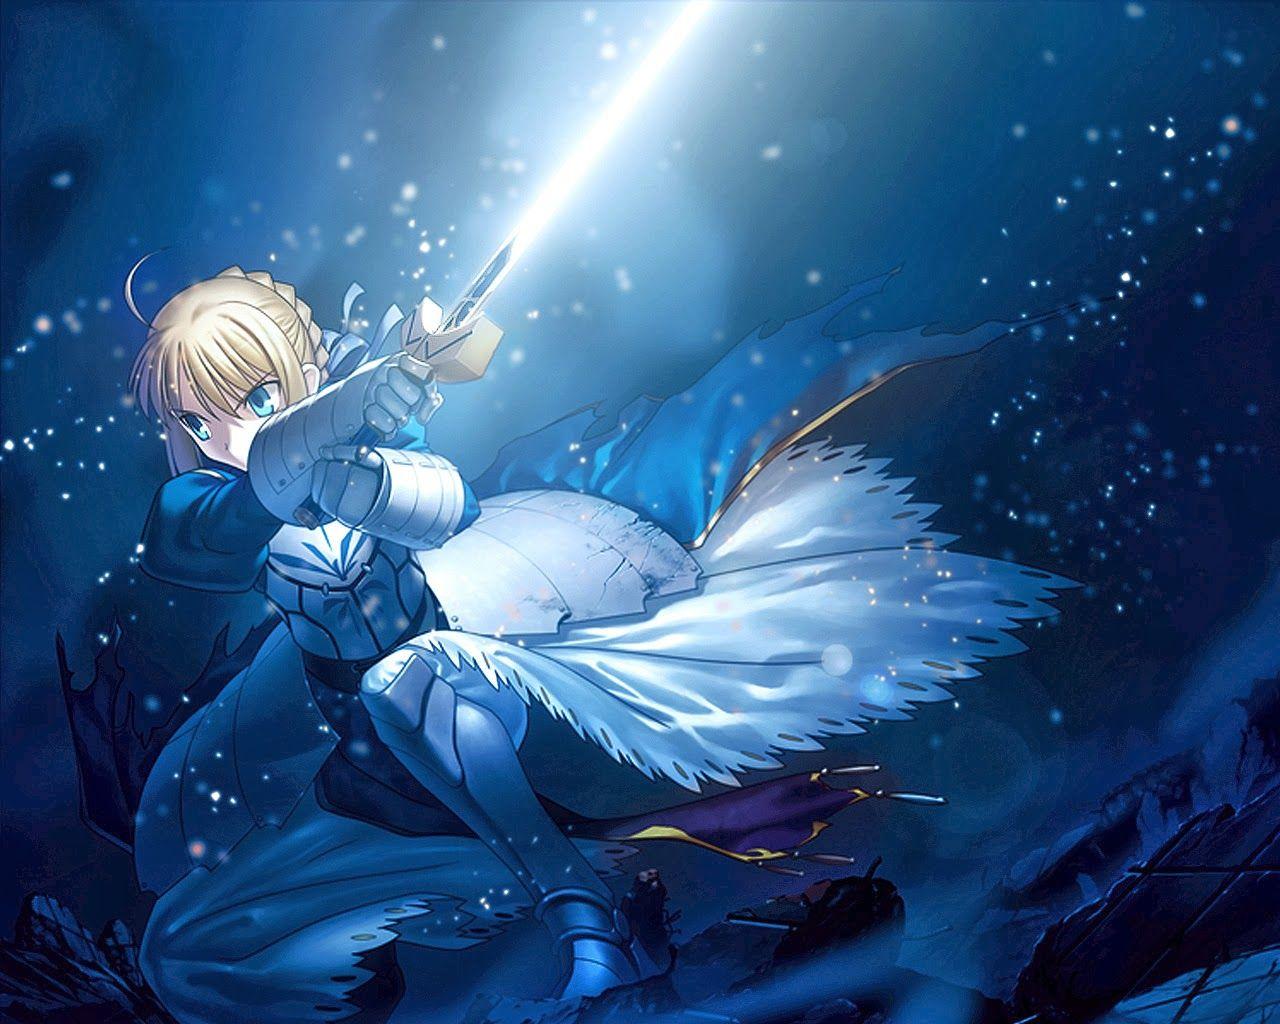 Dark Saber Dark anime, Fate stay night, Anime wallpaper